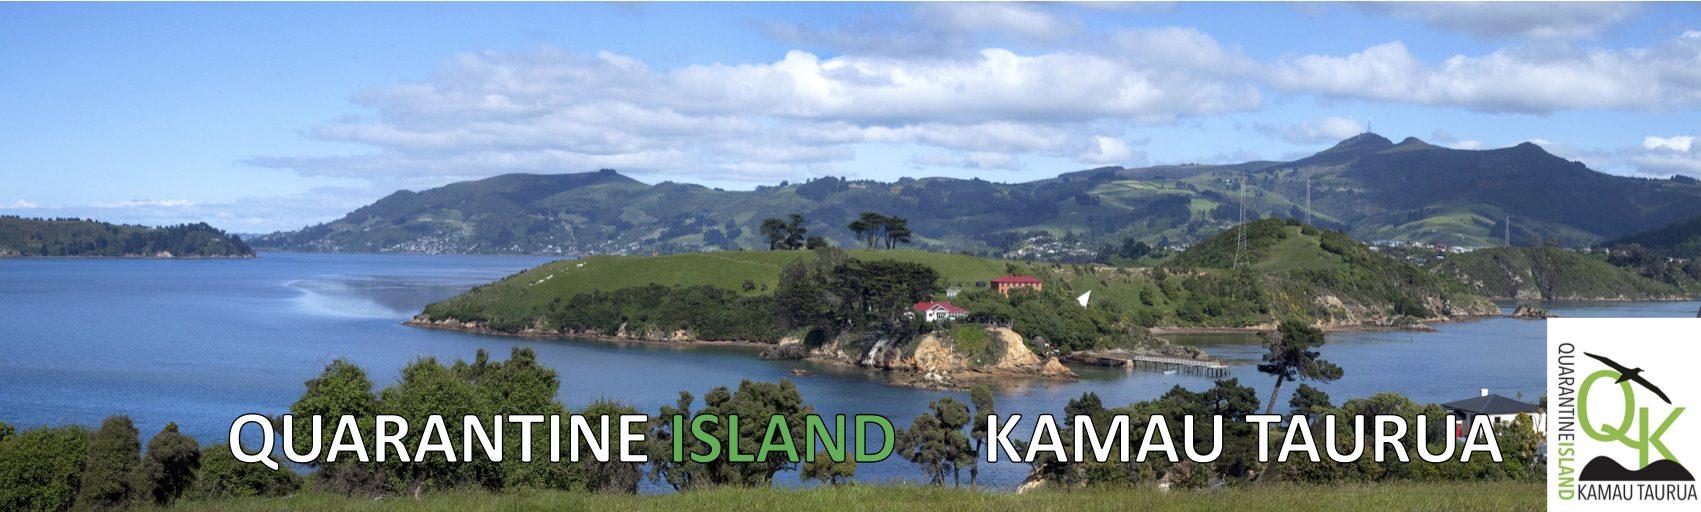 Quarantine Island / Kamau Taurua